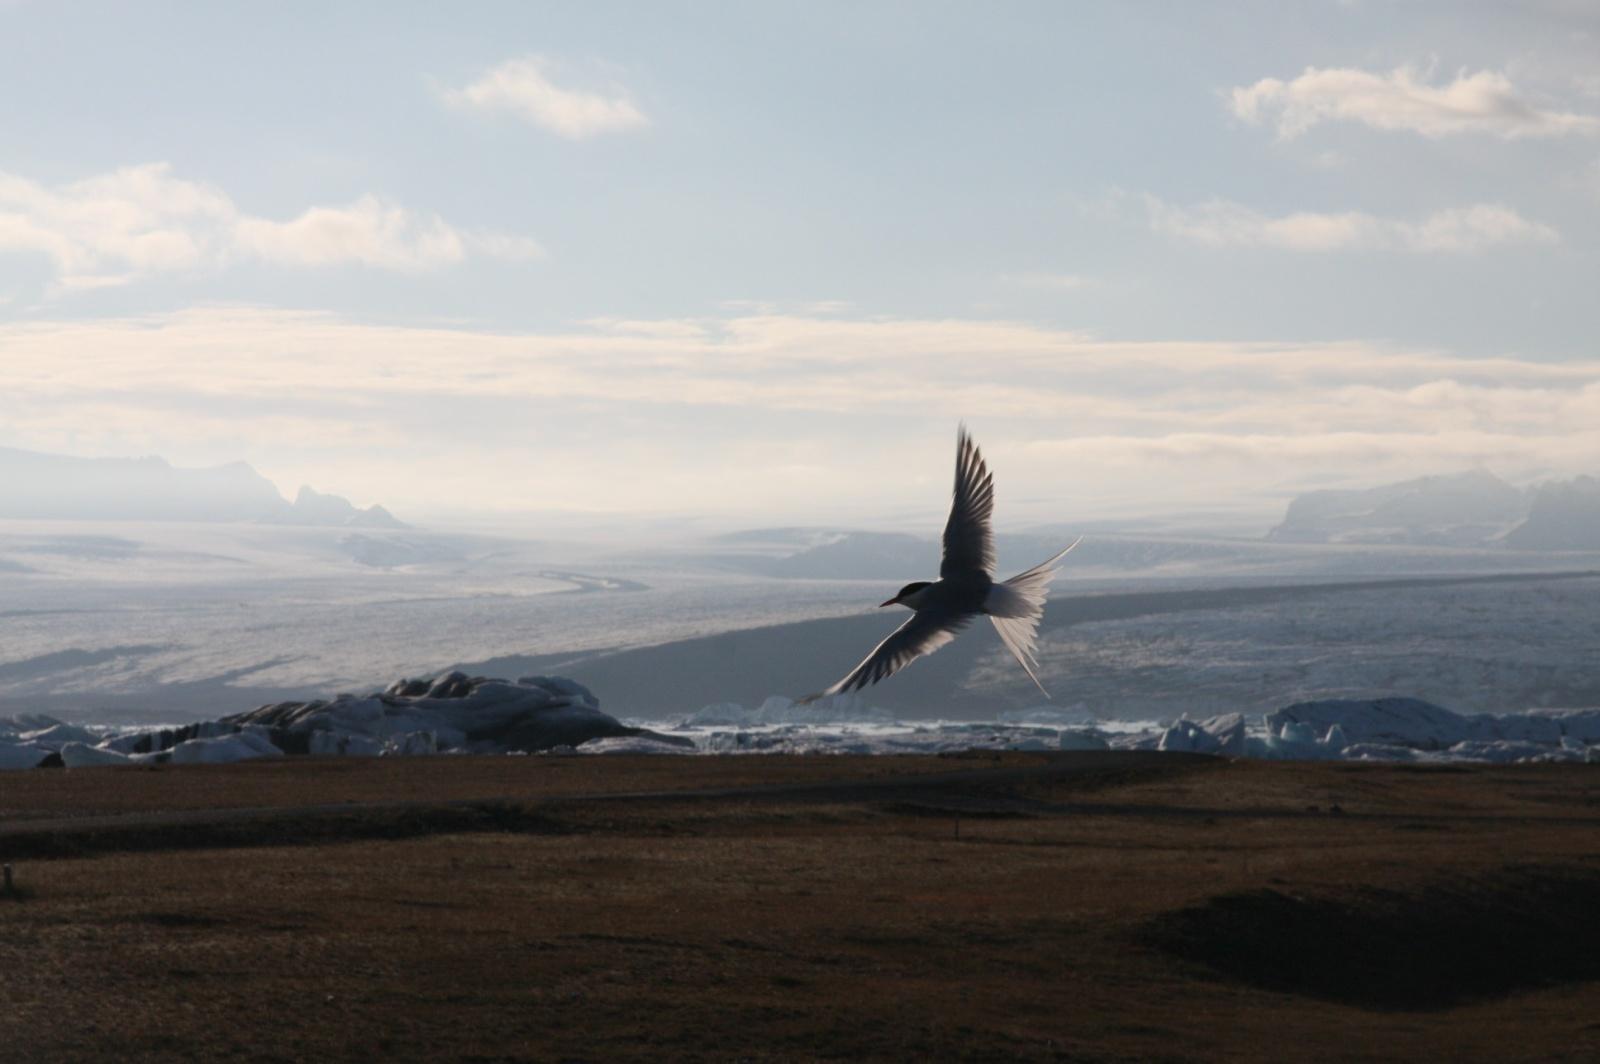 Approaching the glacier and Jökulsárlón